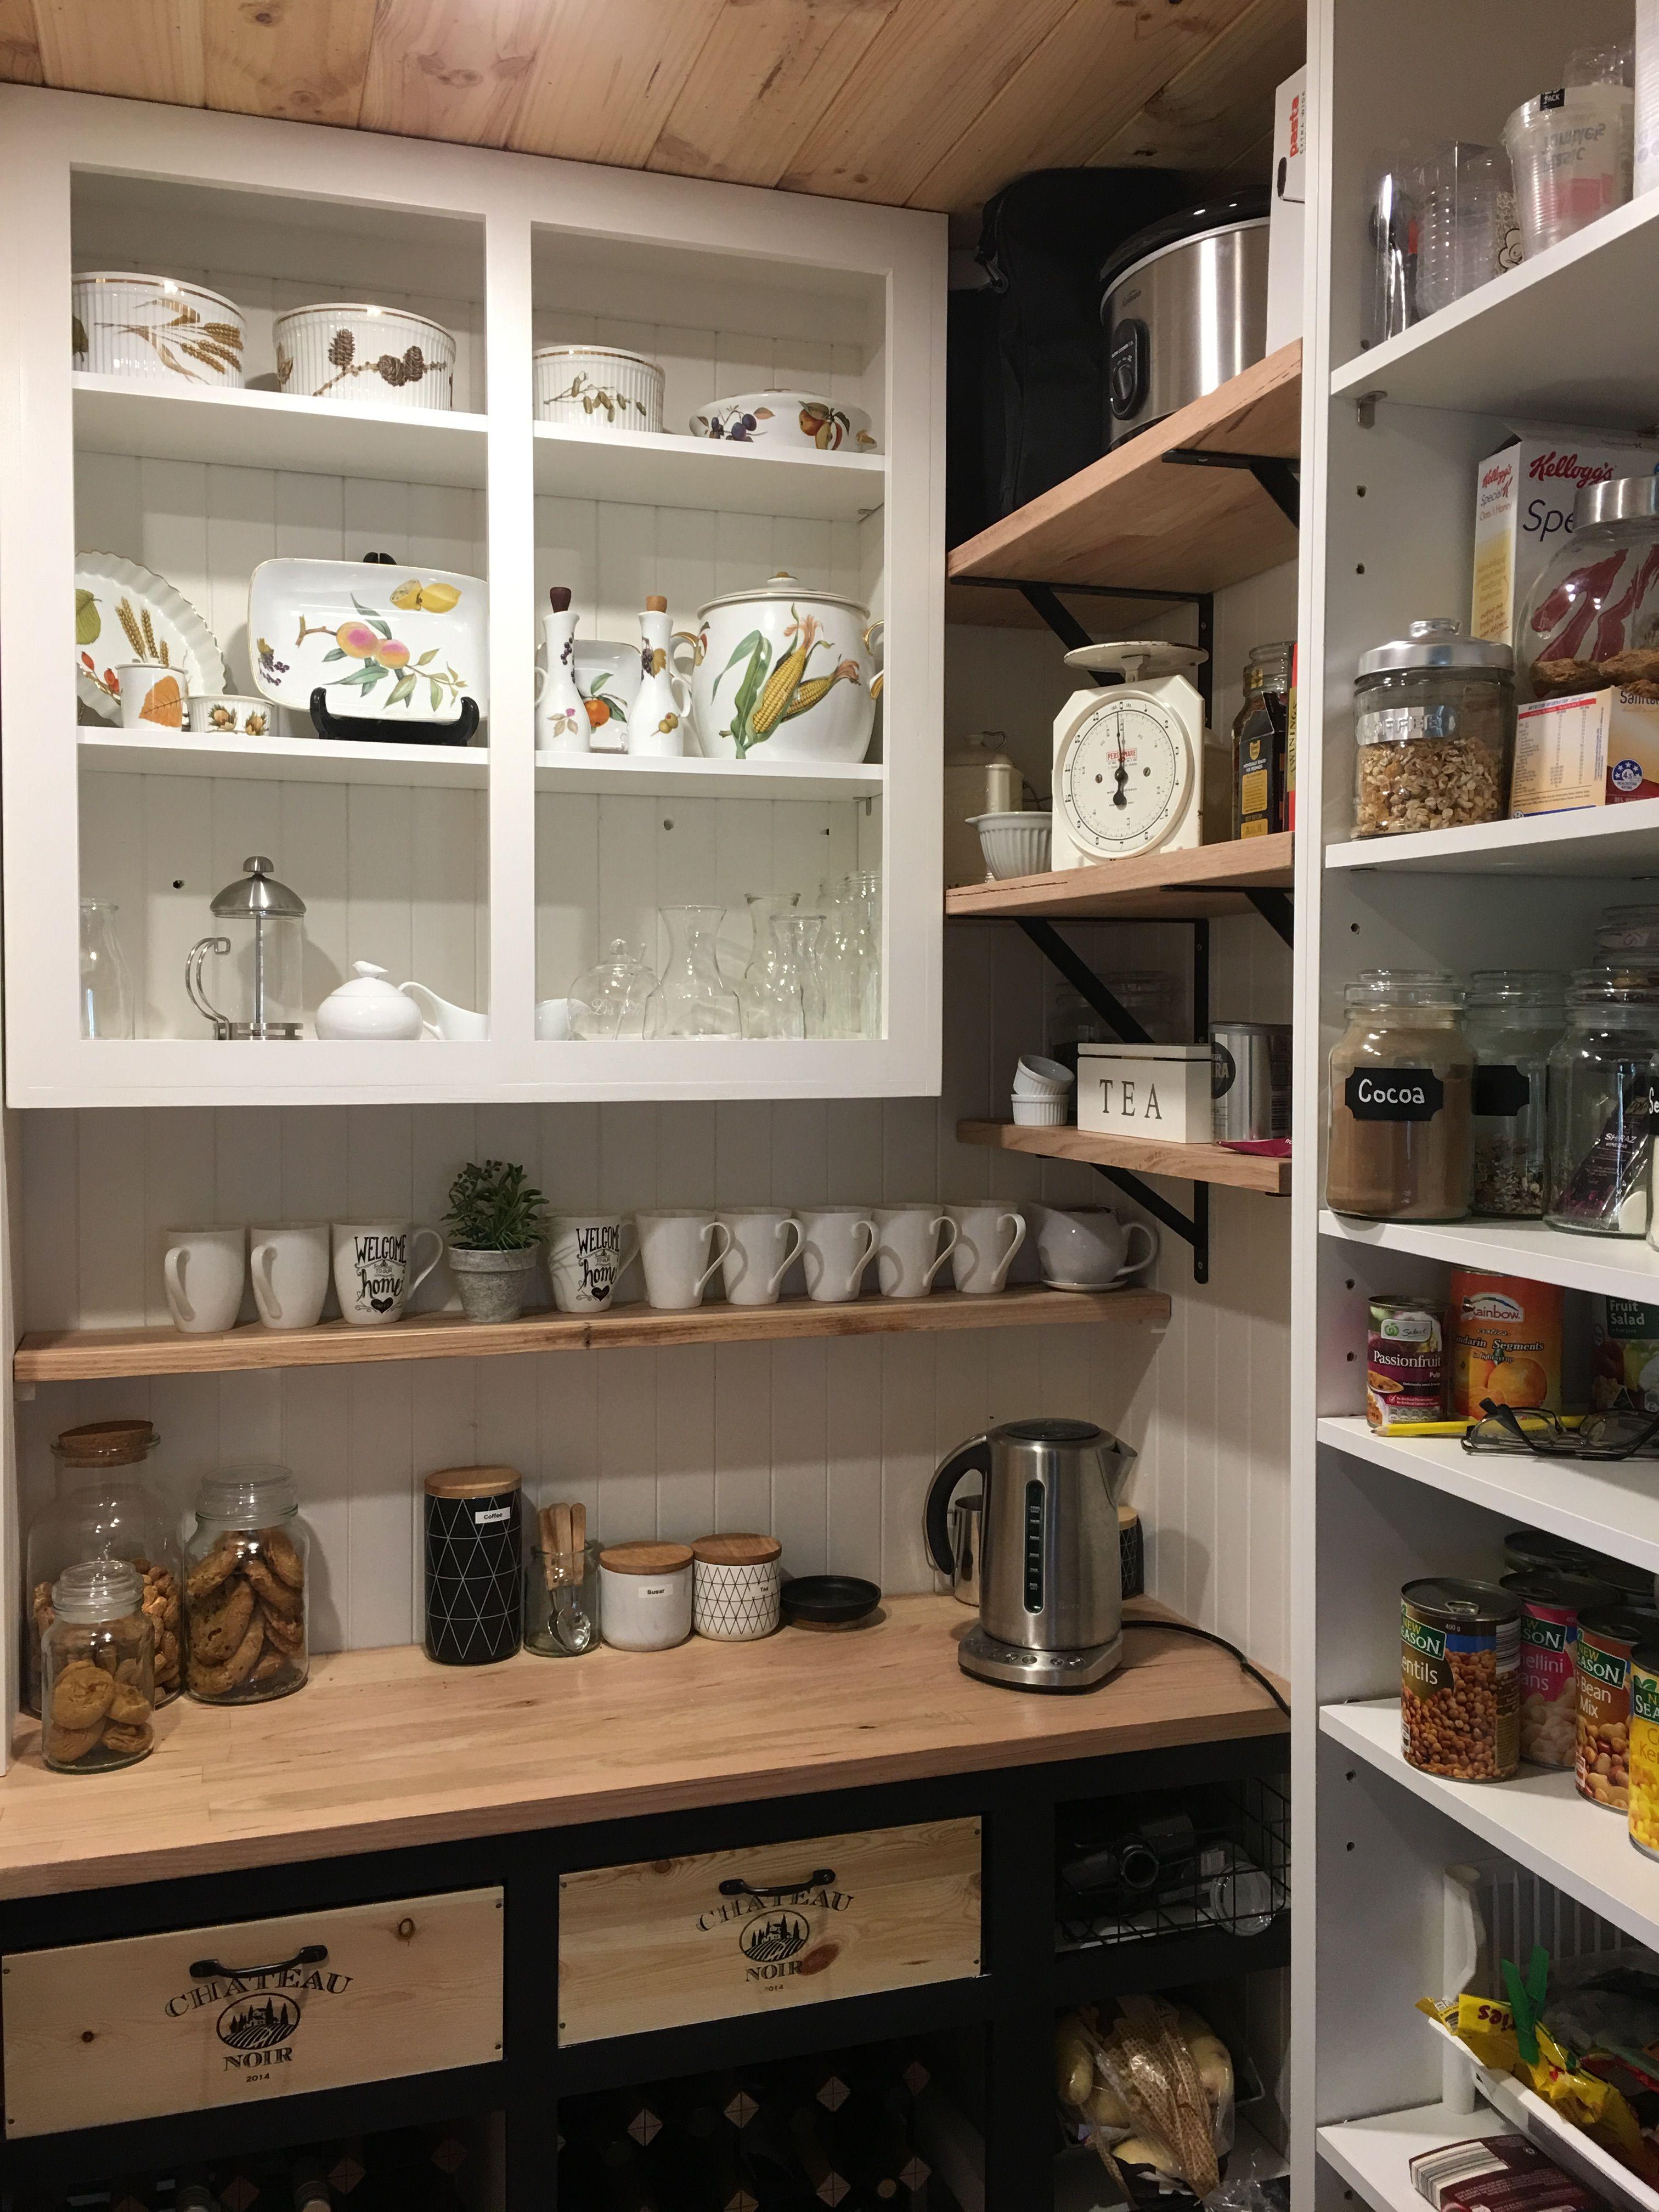 Our Diy Butlers Pantry Kitchen Renovation Diy Pantry Shelves Kitchen Decor